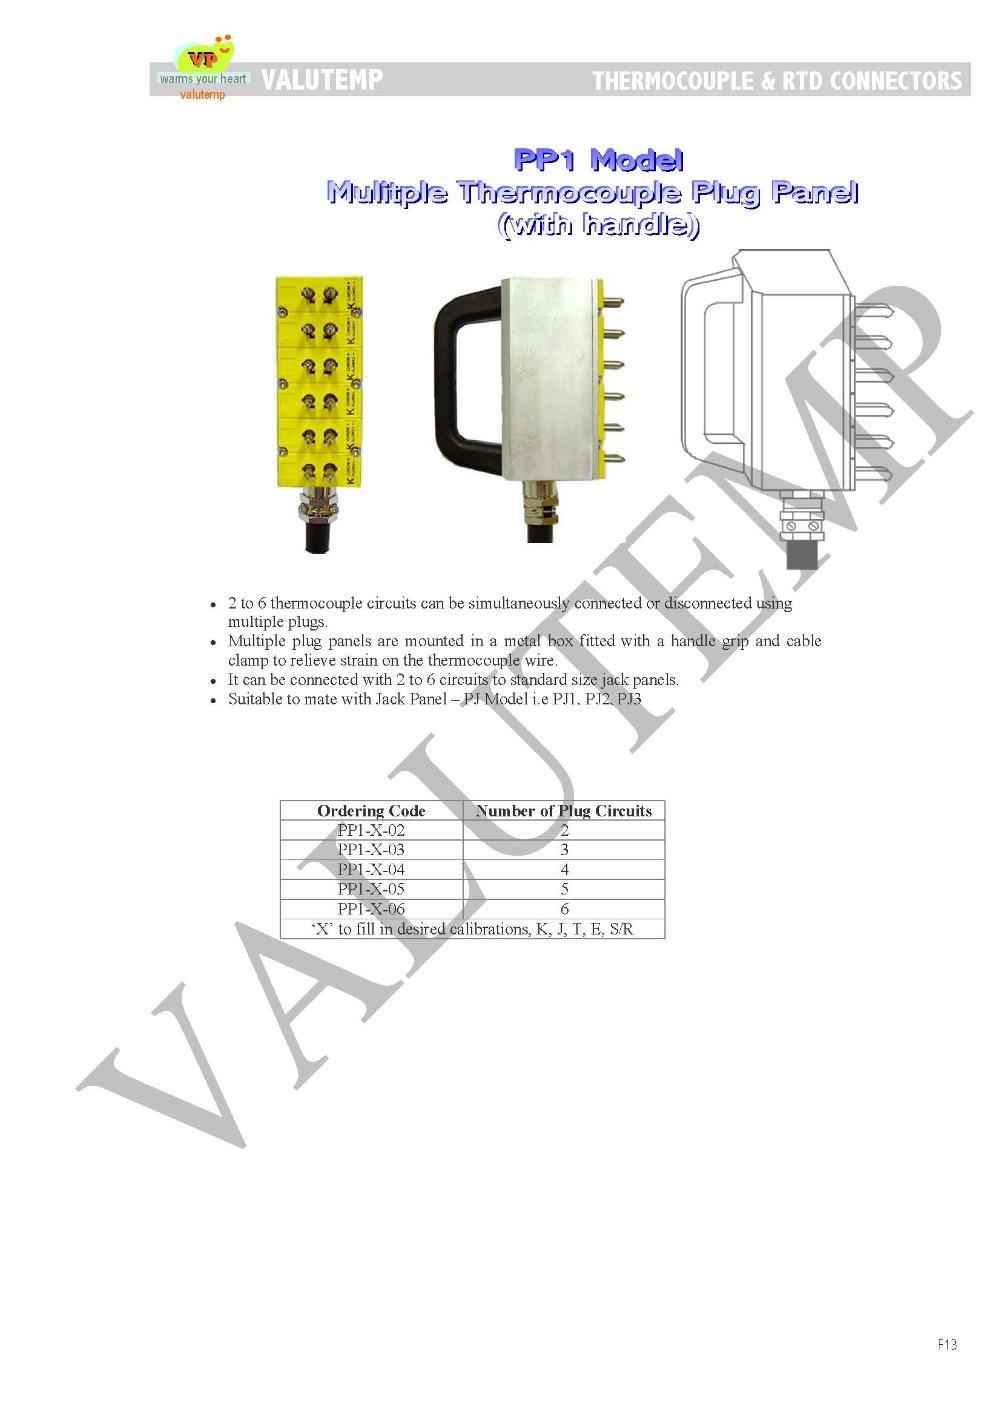 Multiple Thermocouple Plug Panel Buy Plugmini Circuit